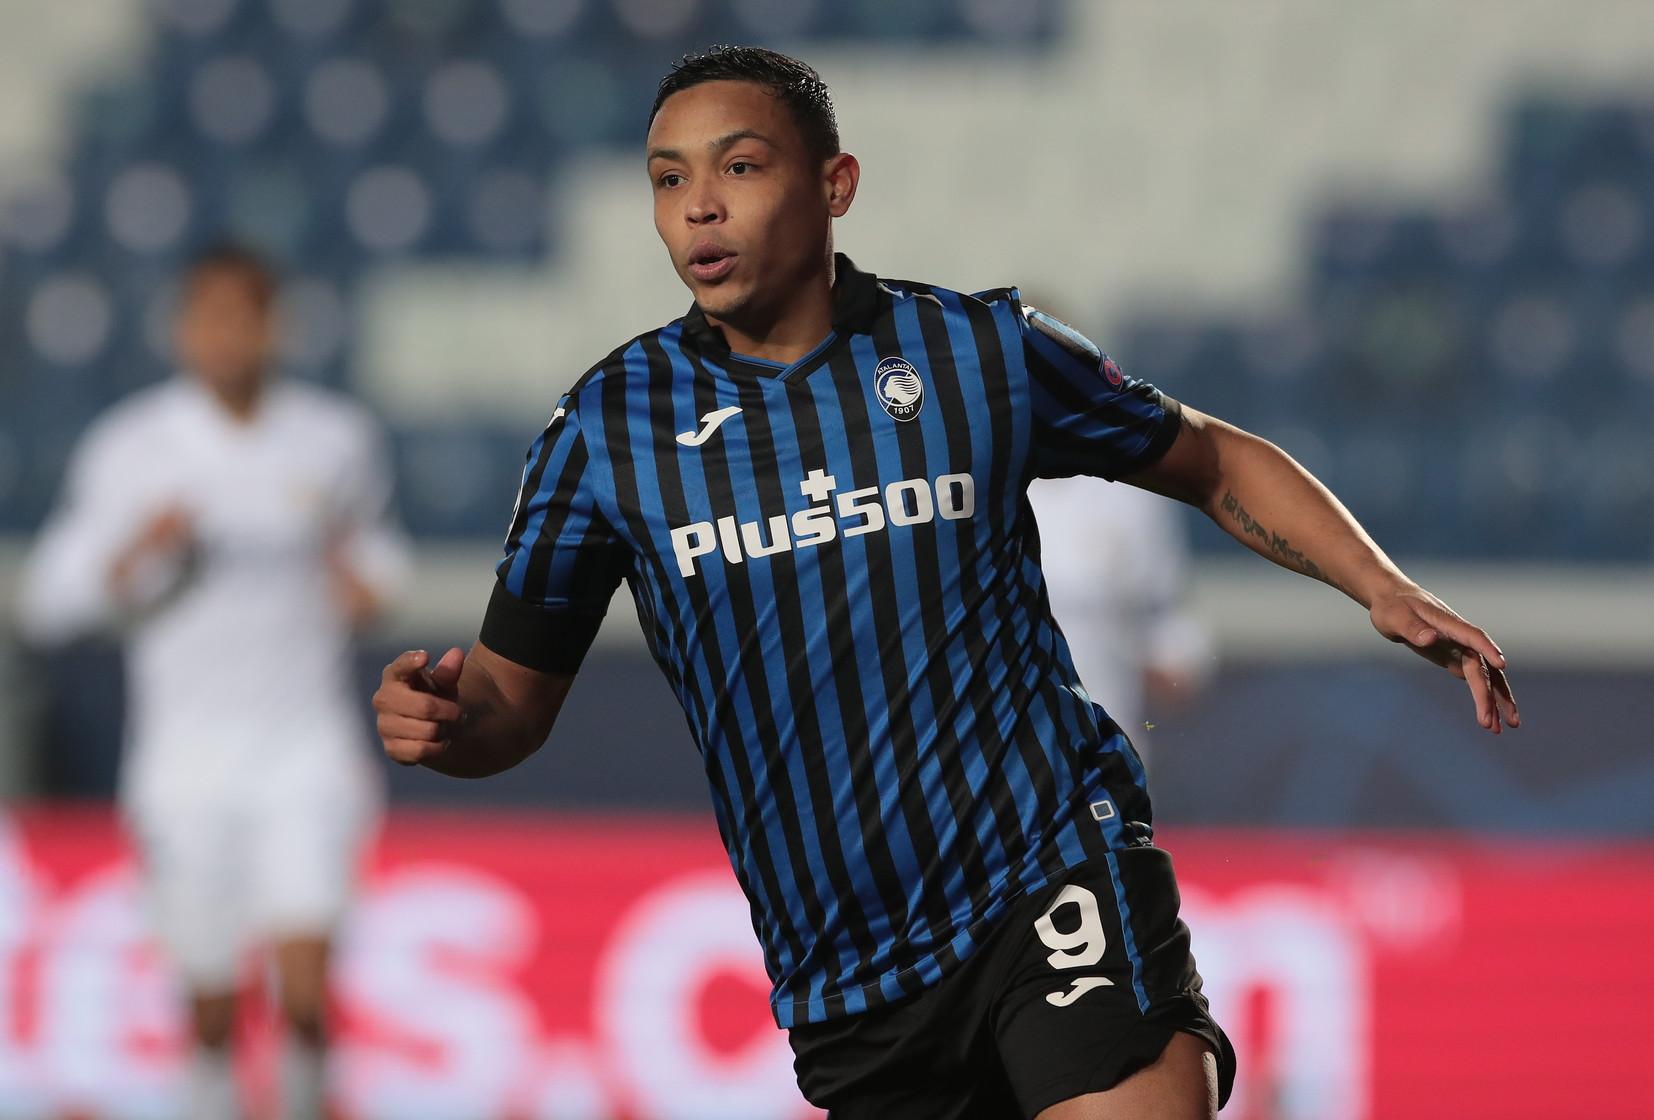 3) Muriel (Atalanta): ha partecipato a 20 gol, 14 gol e 6 assist